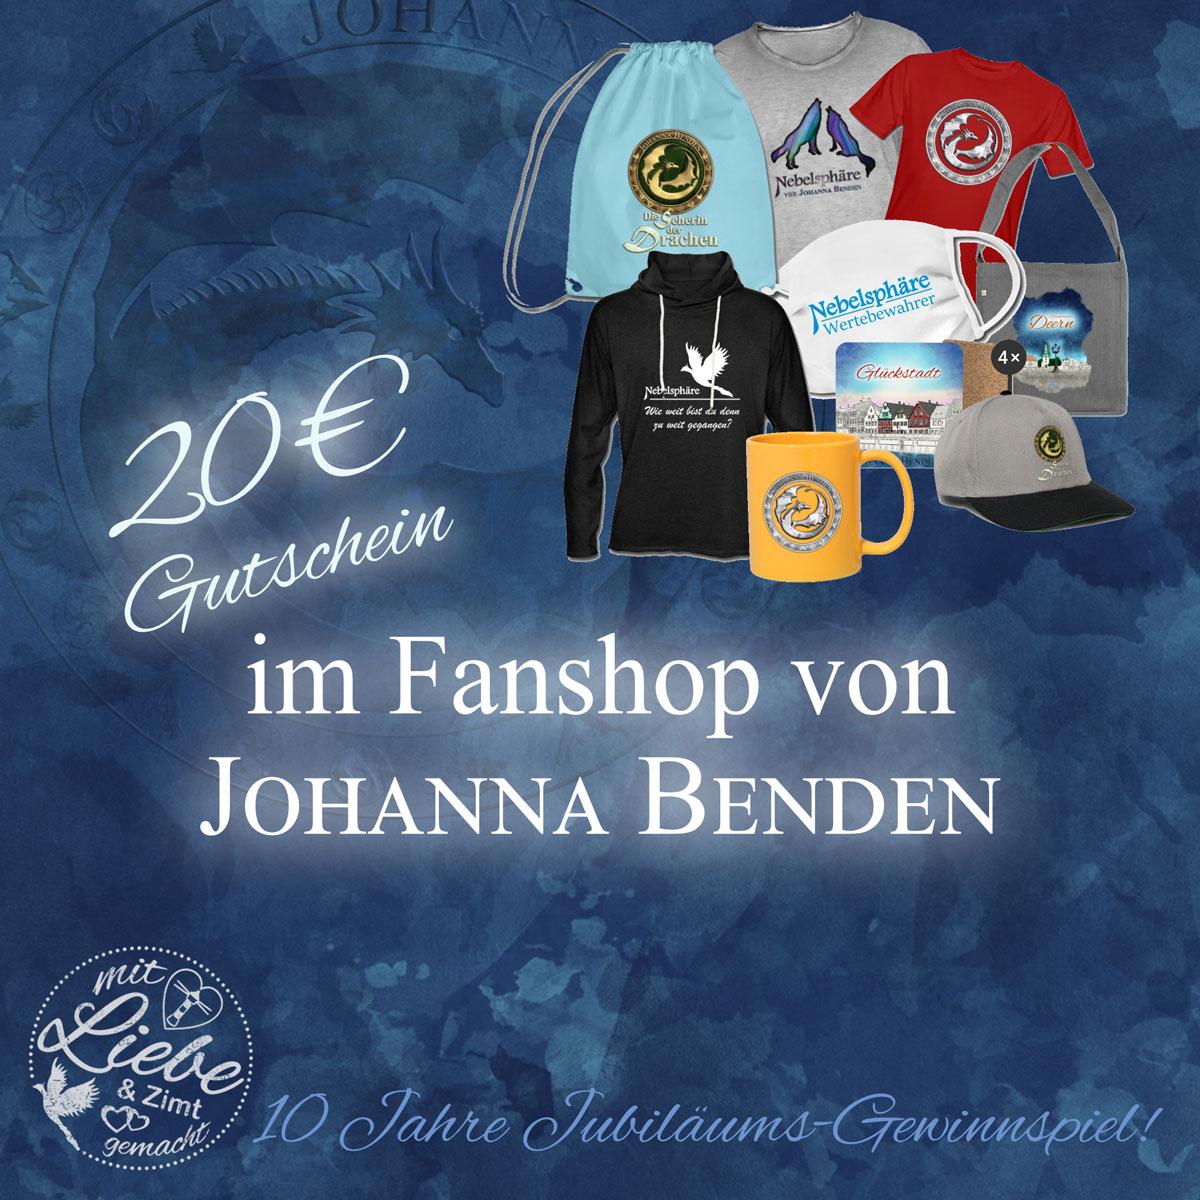 10 Jahre Johanna Benden!